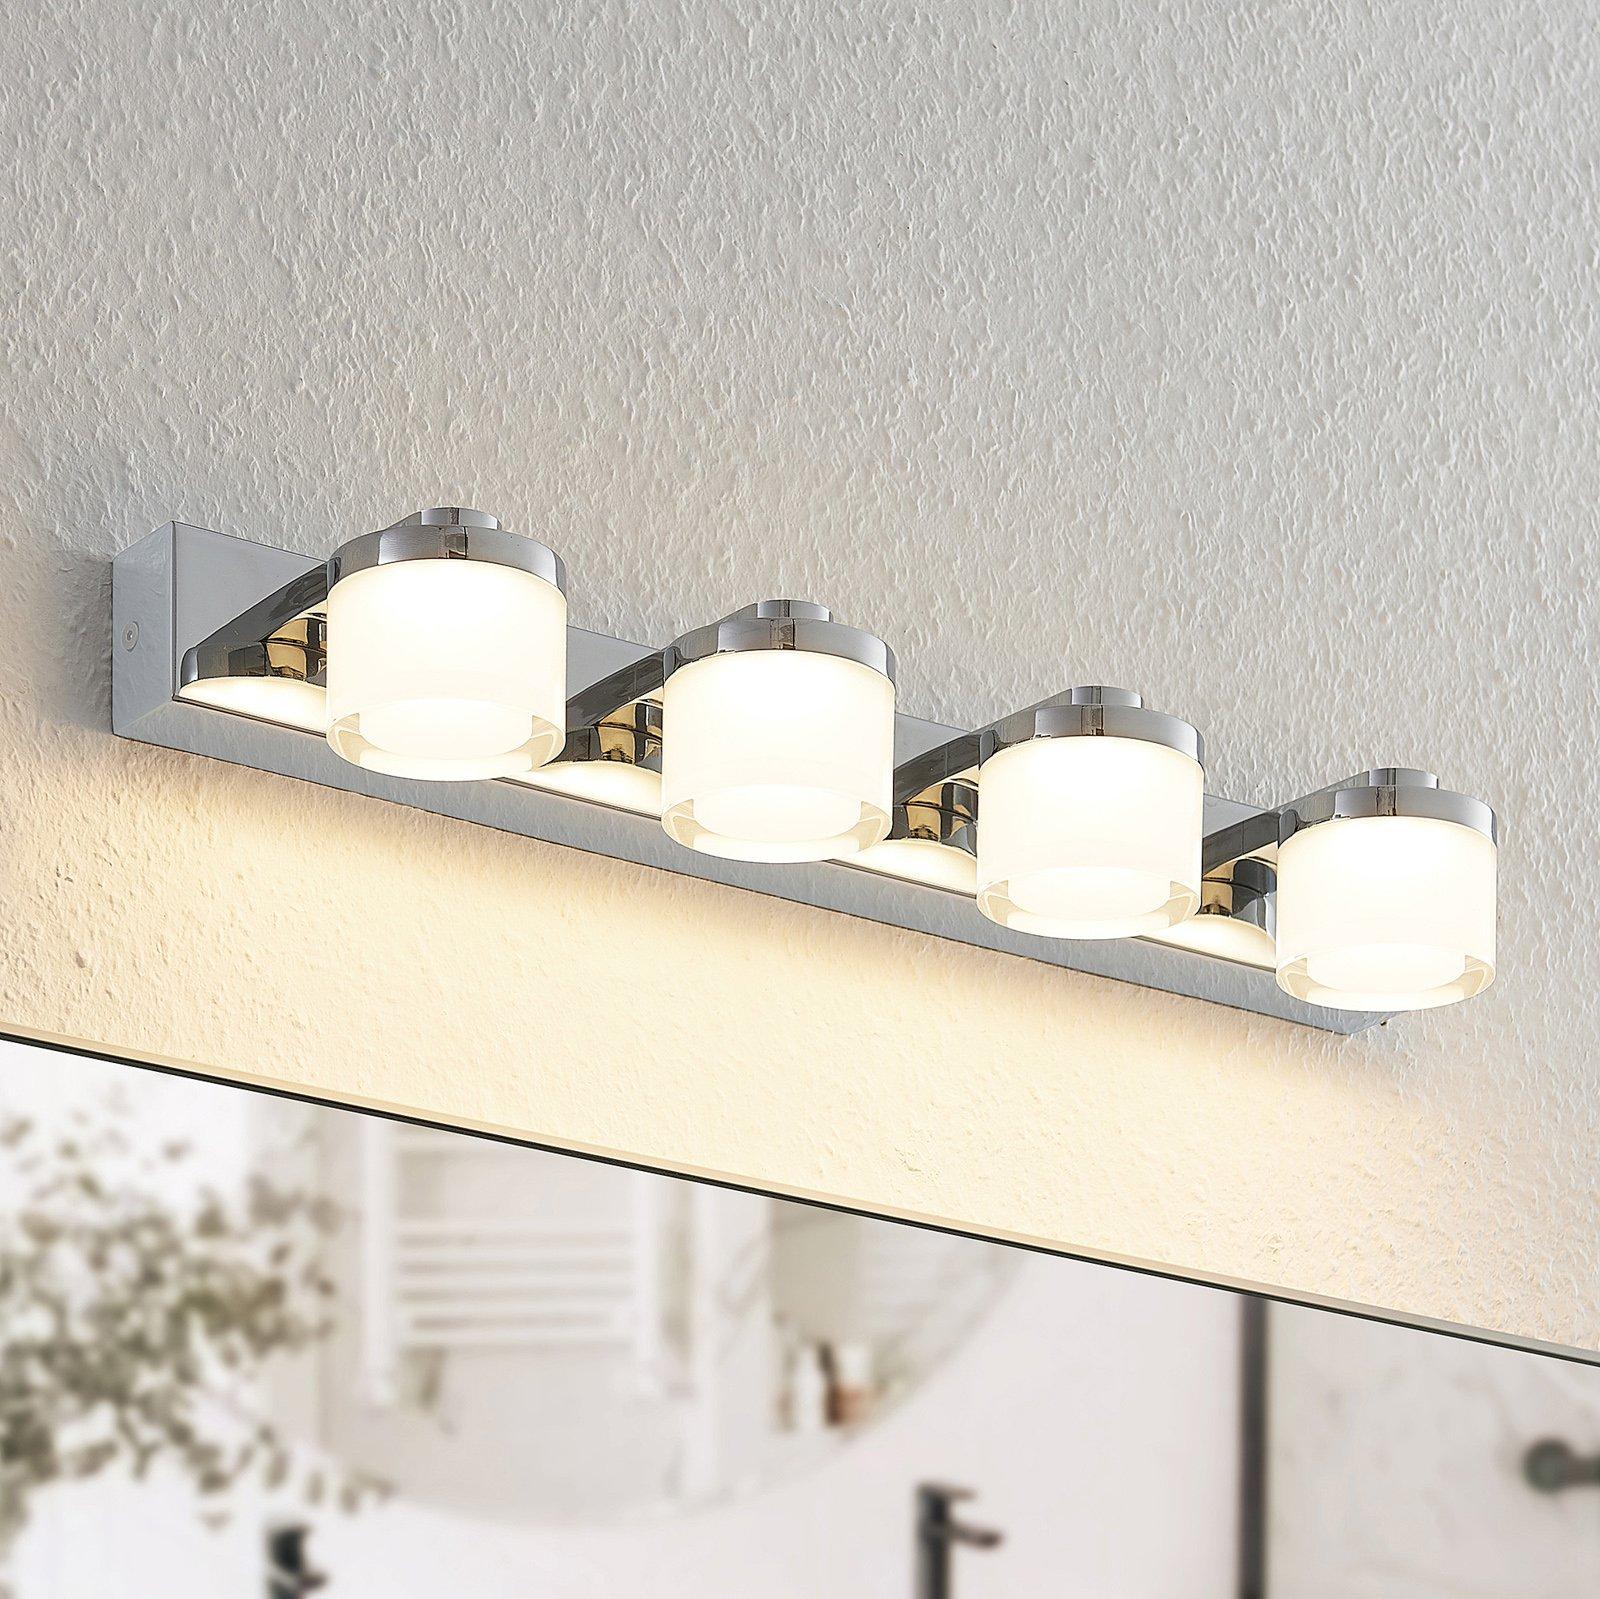 Arcchio Kejan LED-vegglampe, IP44, 4 lyskilder